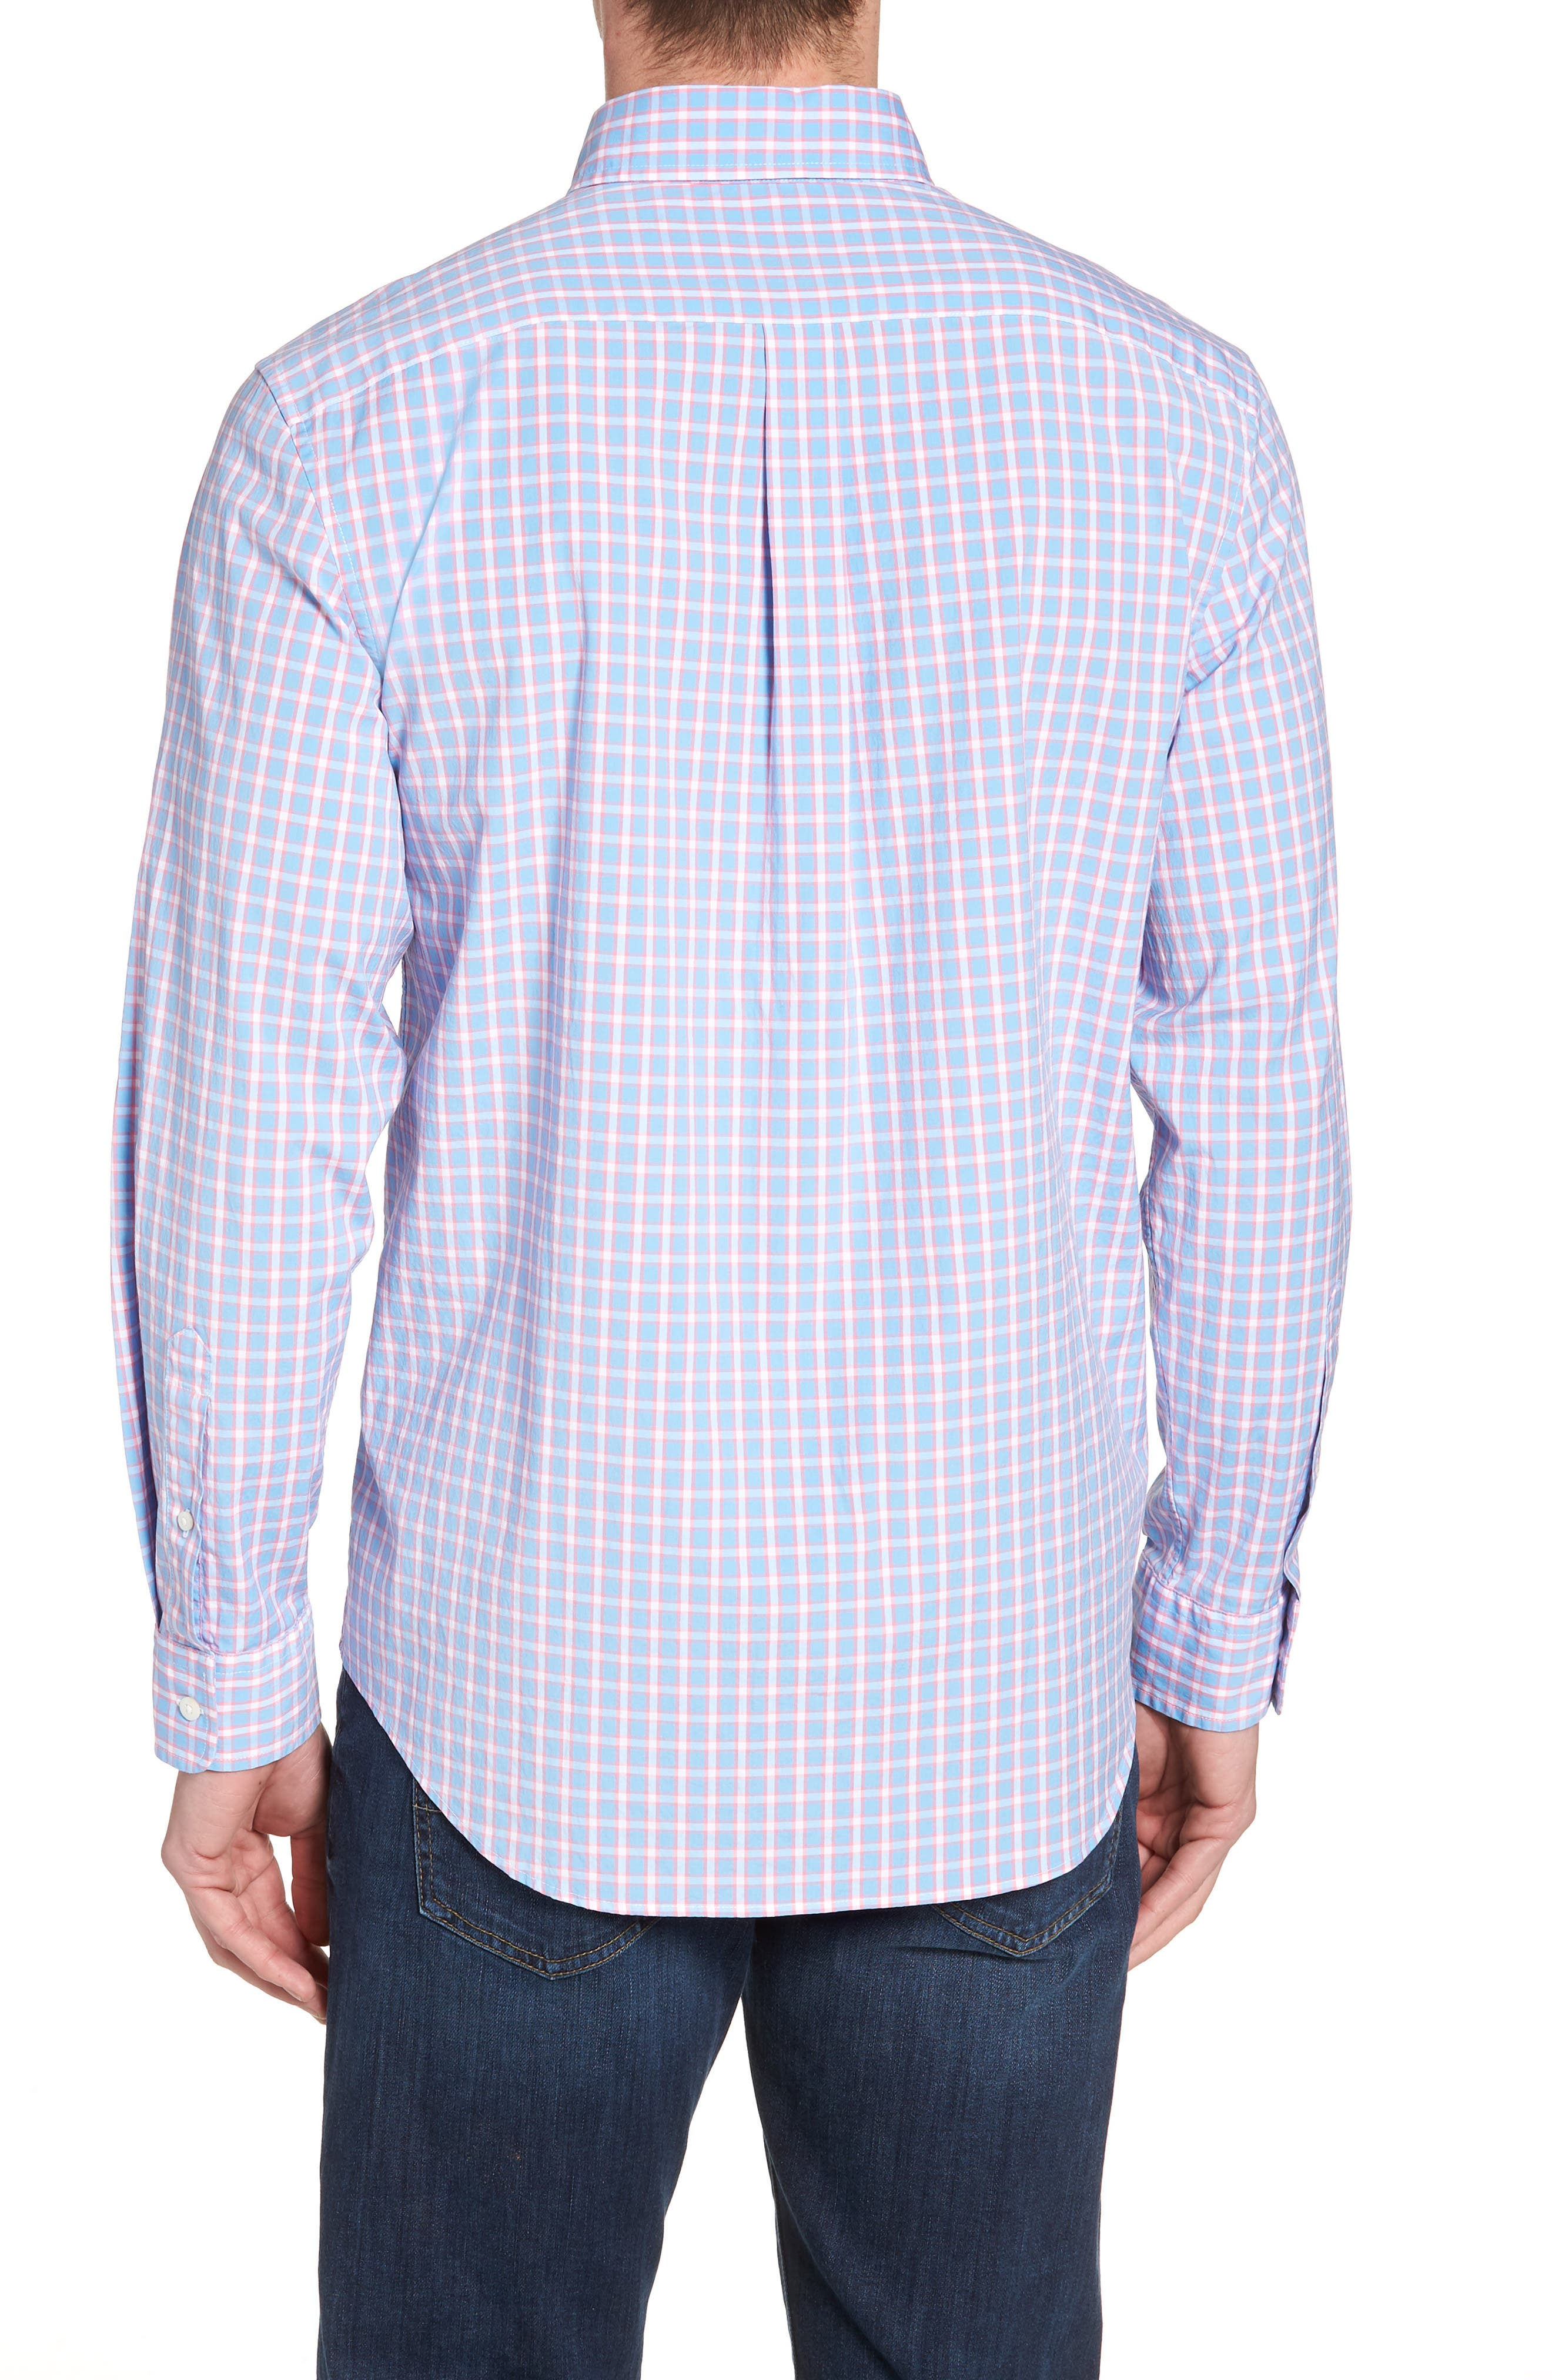 Harlock Pond Plaid Classic Fit Sport Shirt,                             Alternate thumbnail 2, color,                             OCEAN BREEZE